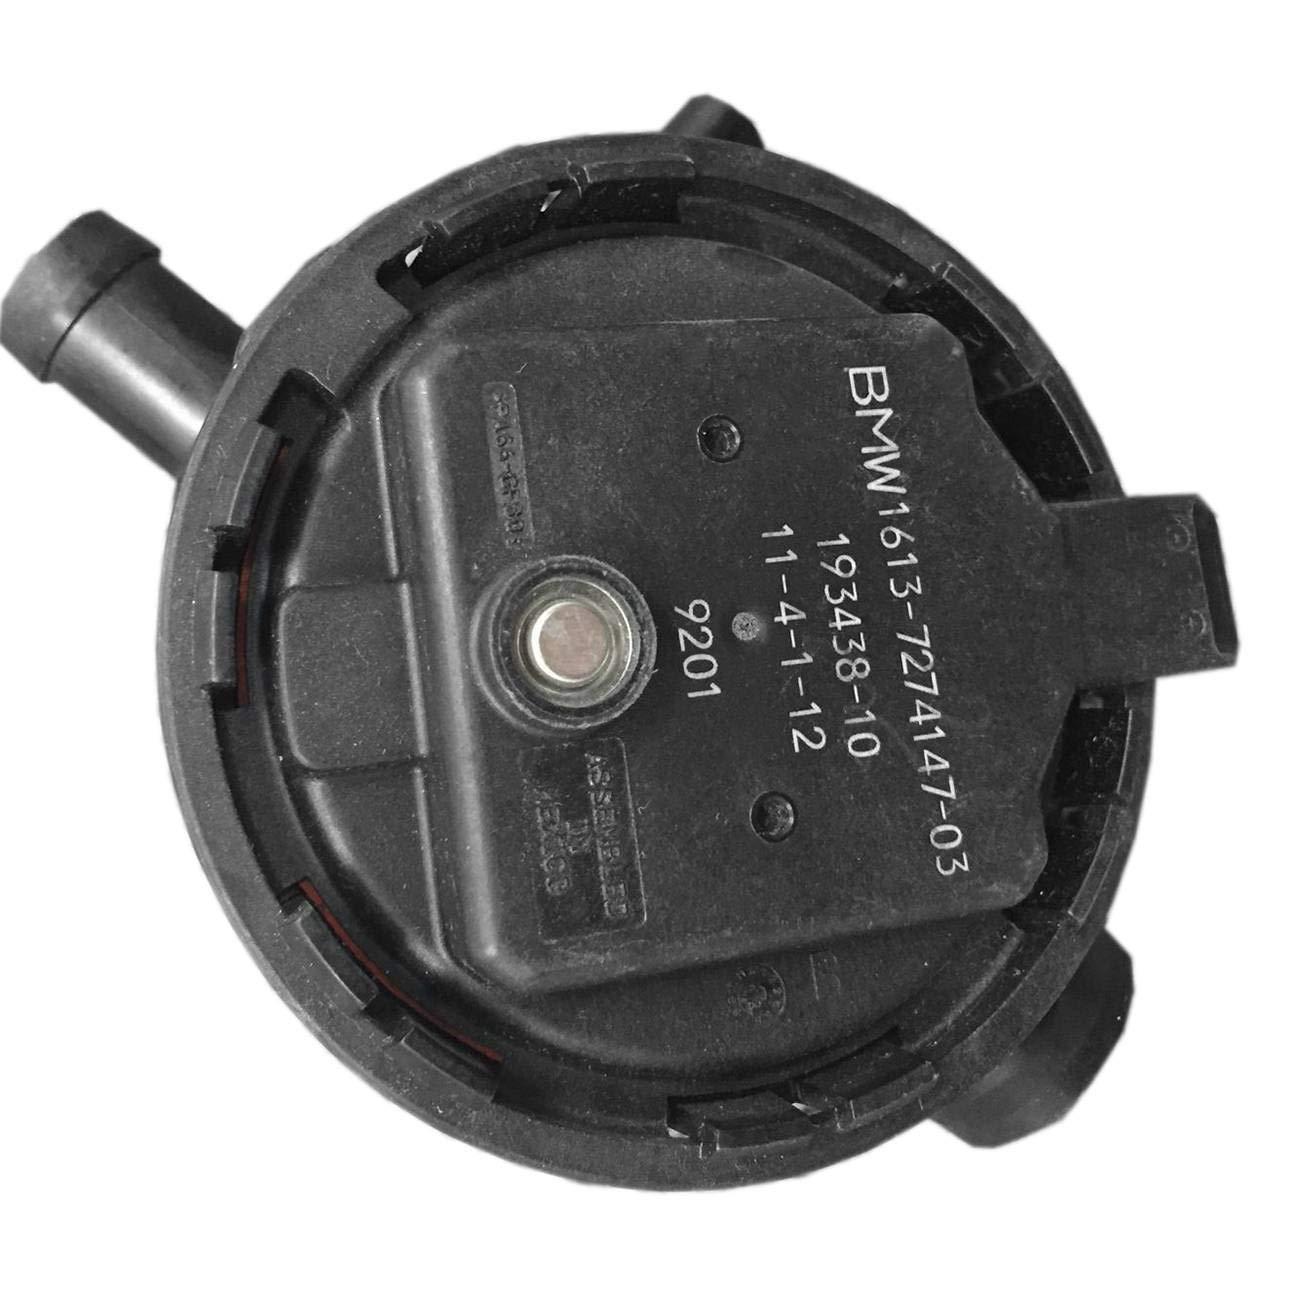 Deebior 1pc Genuine Leak Detect Diagnosis Pressure Switch/Module 16137448091 For BMW 528 535 550 640 650 740 750 M5 M6 X3 X4 X5 X6 / Mini Cooper Cooper Countryman Cooper Paceman by Deebior (Image #3)